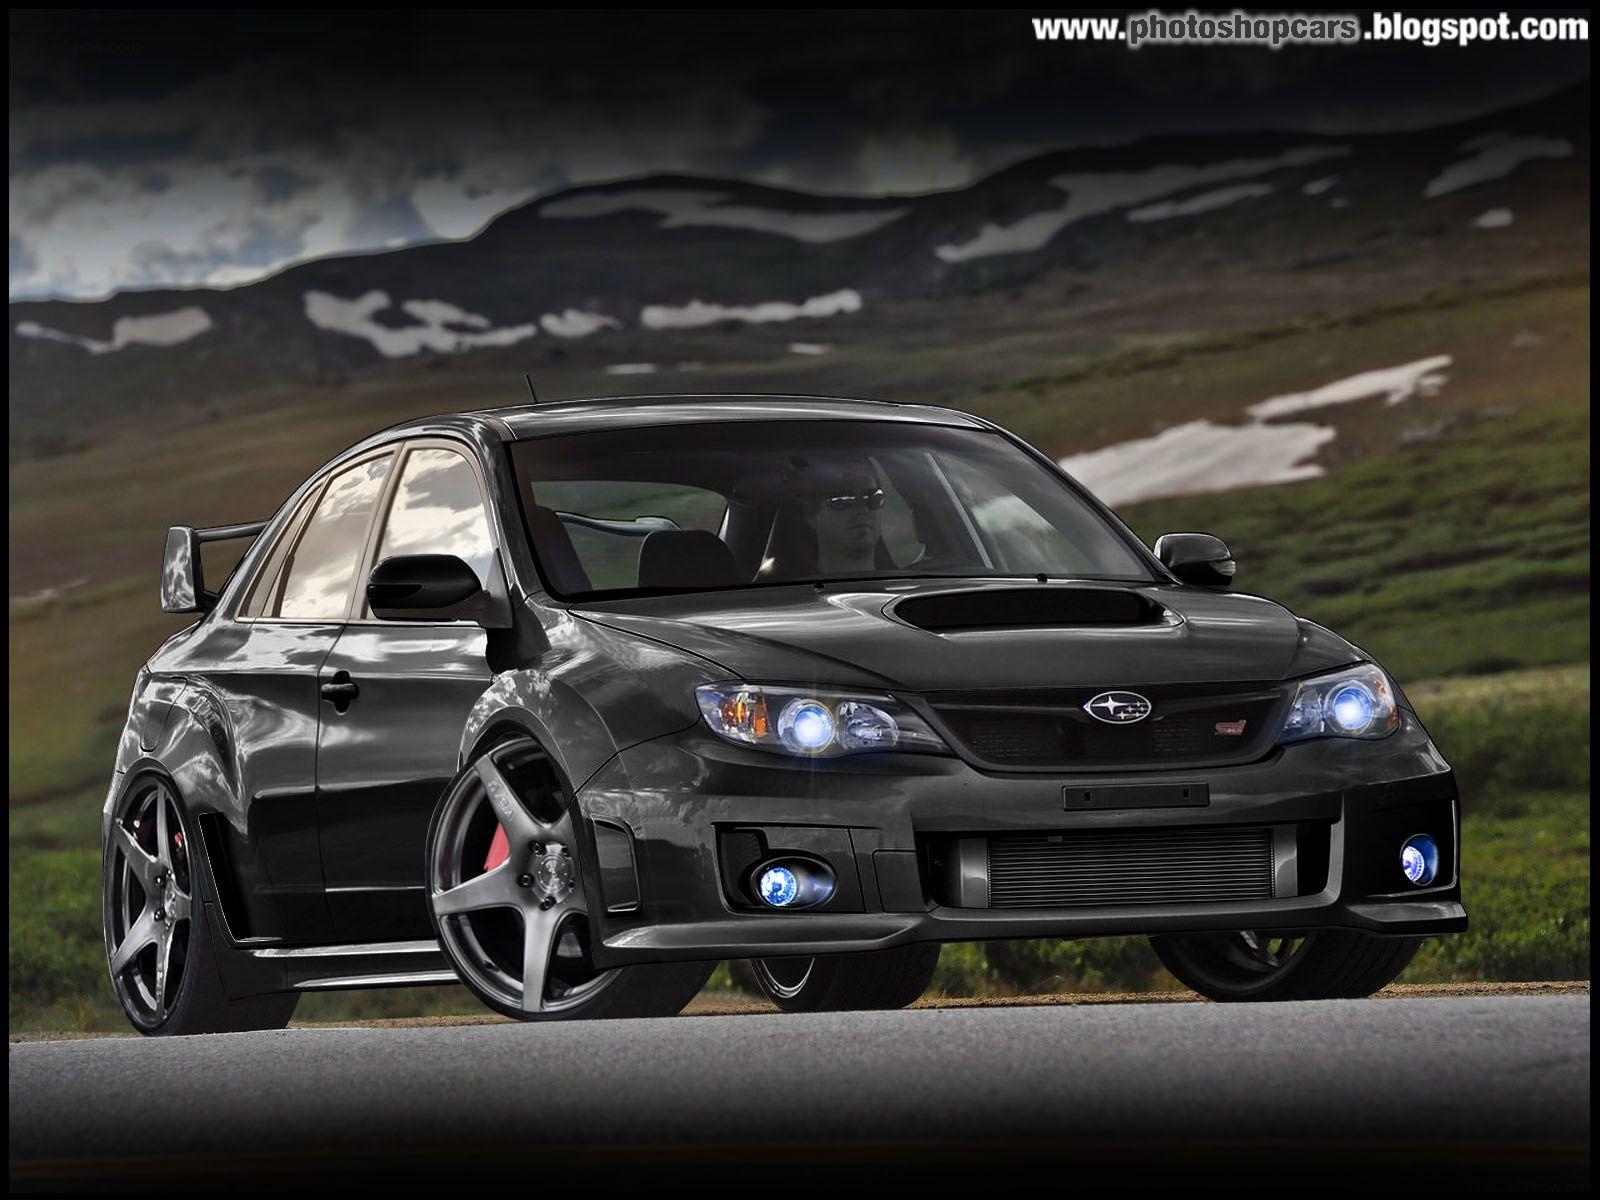 Subaru Impreza Black Hatchback